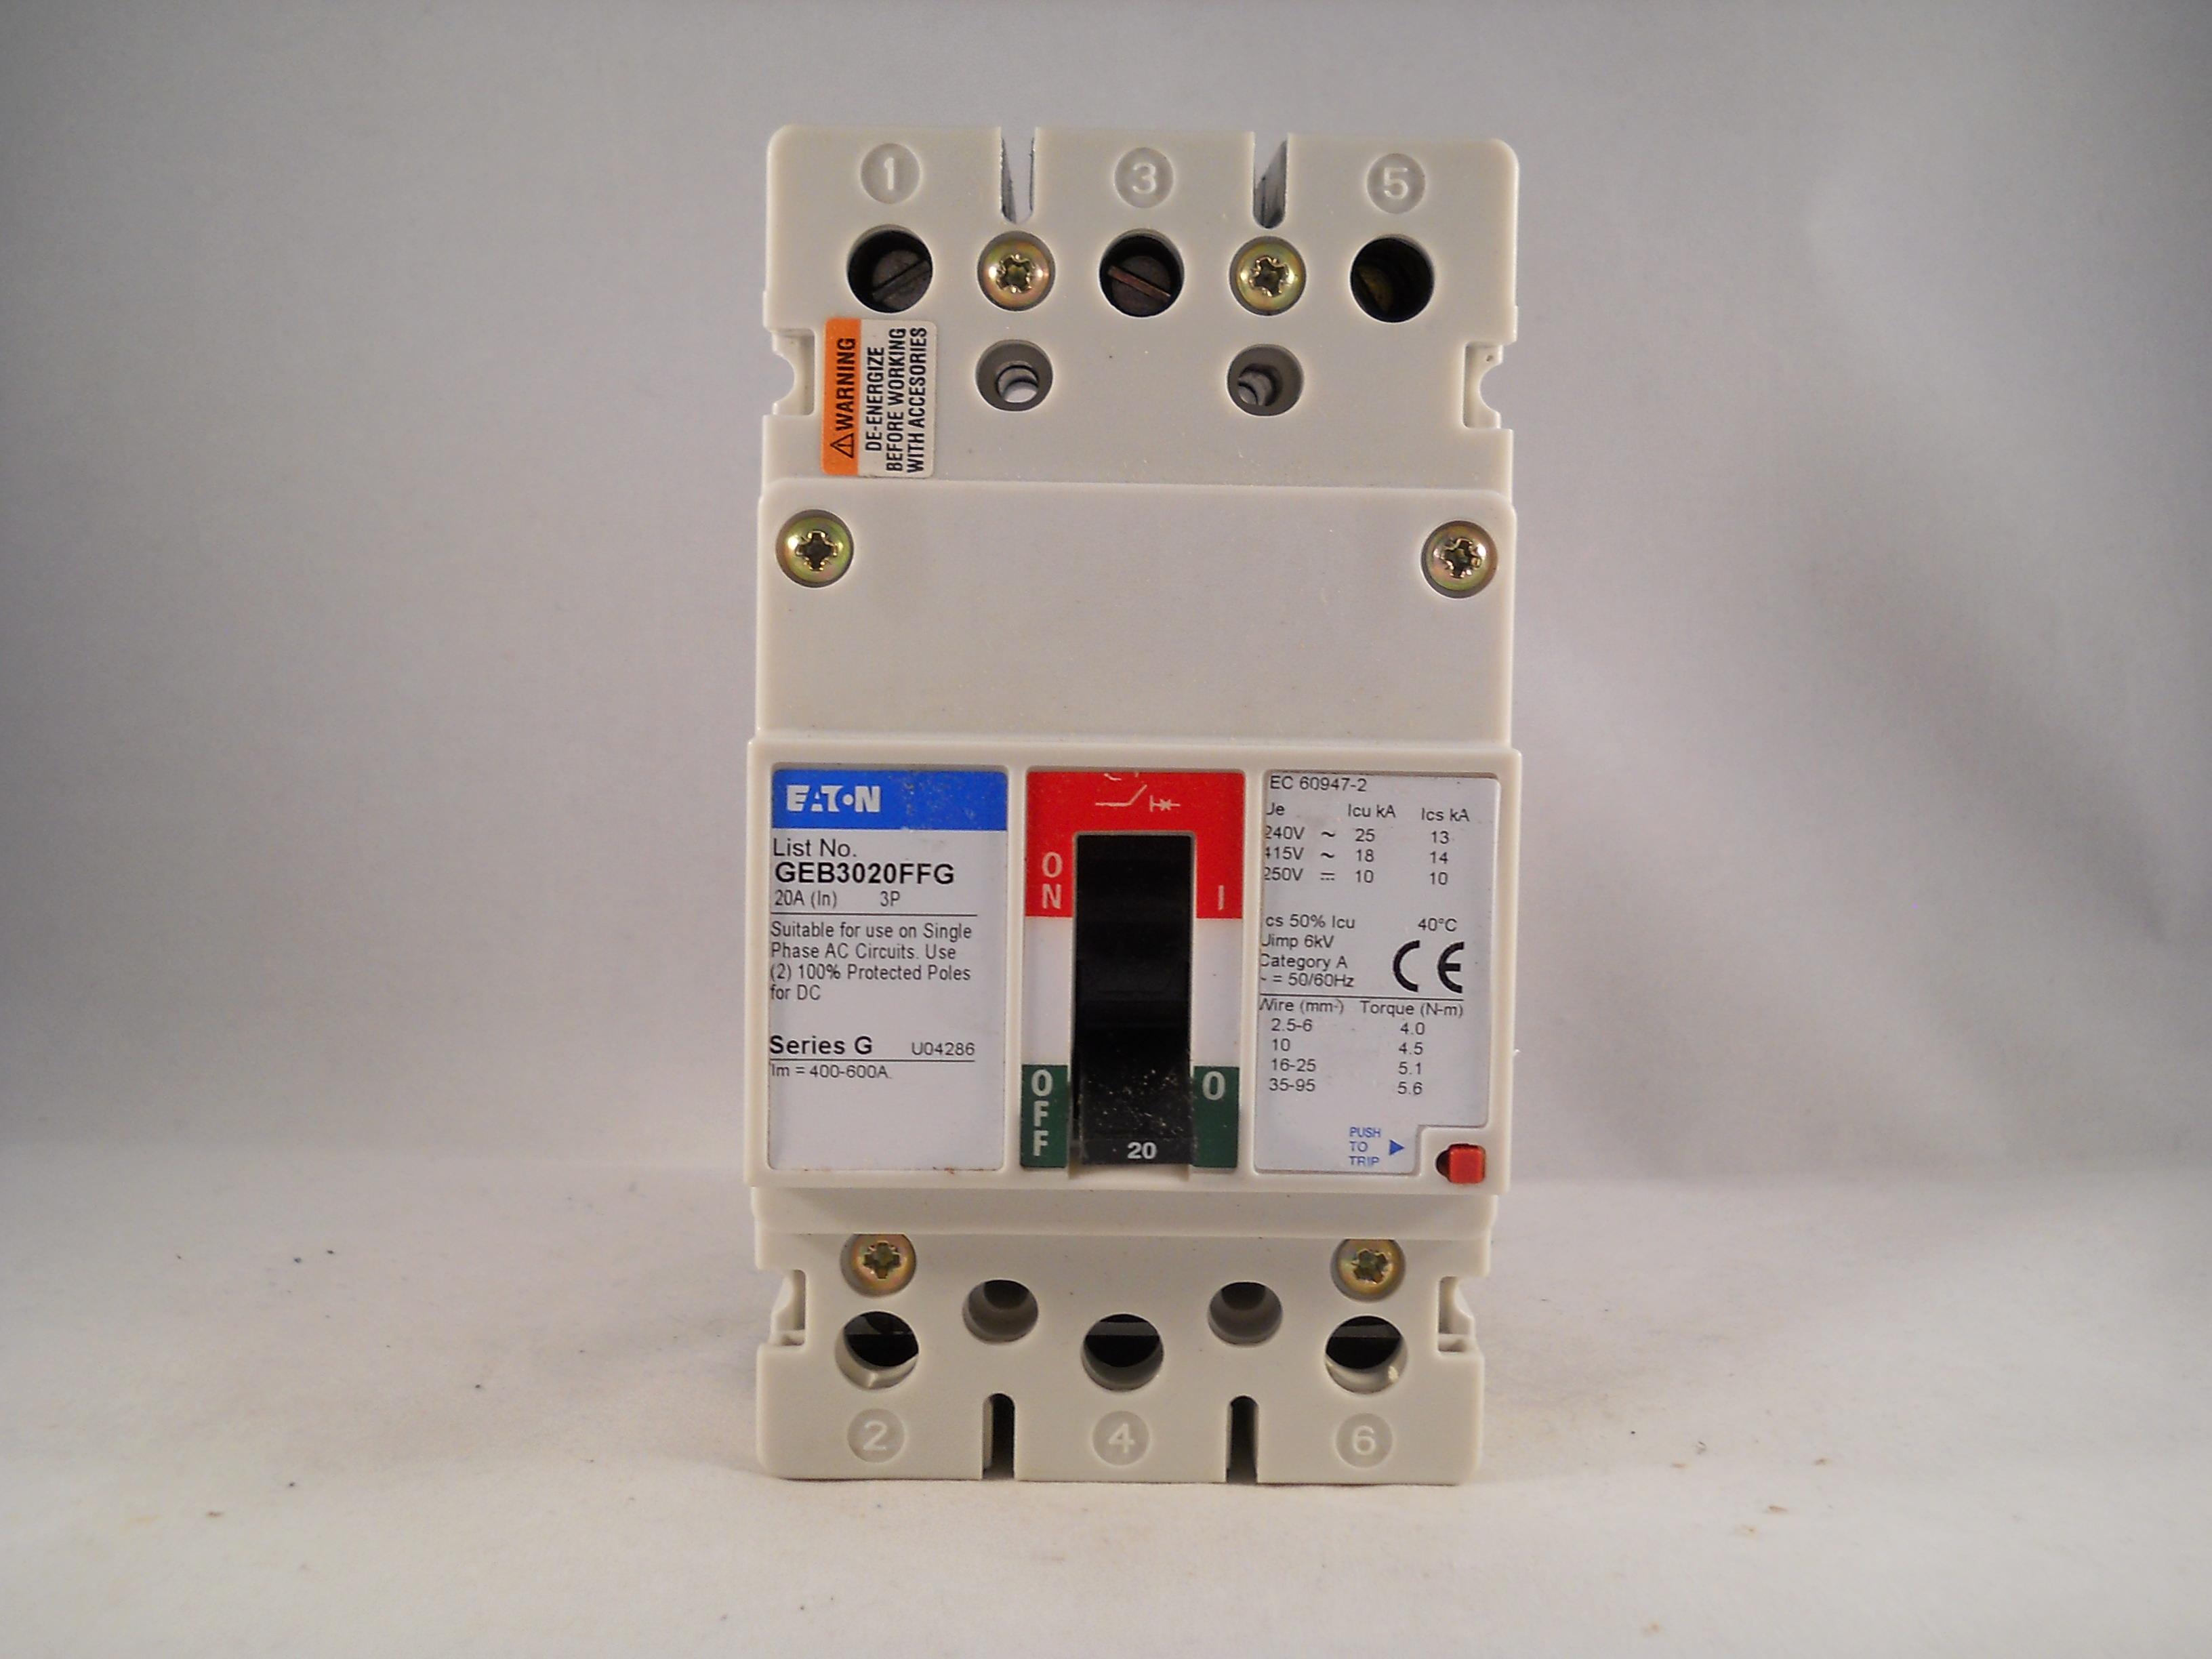 Eaton MCCB 20 Amp Triple Pole 20A 3 Phase Series G GEE3020FFG GEB3020FFG NEW